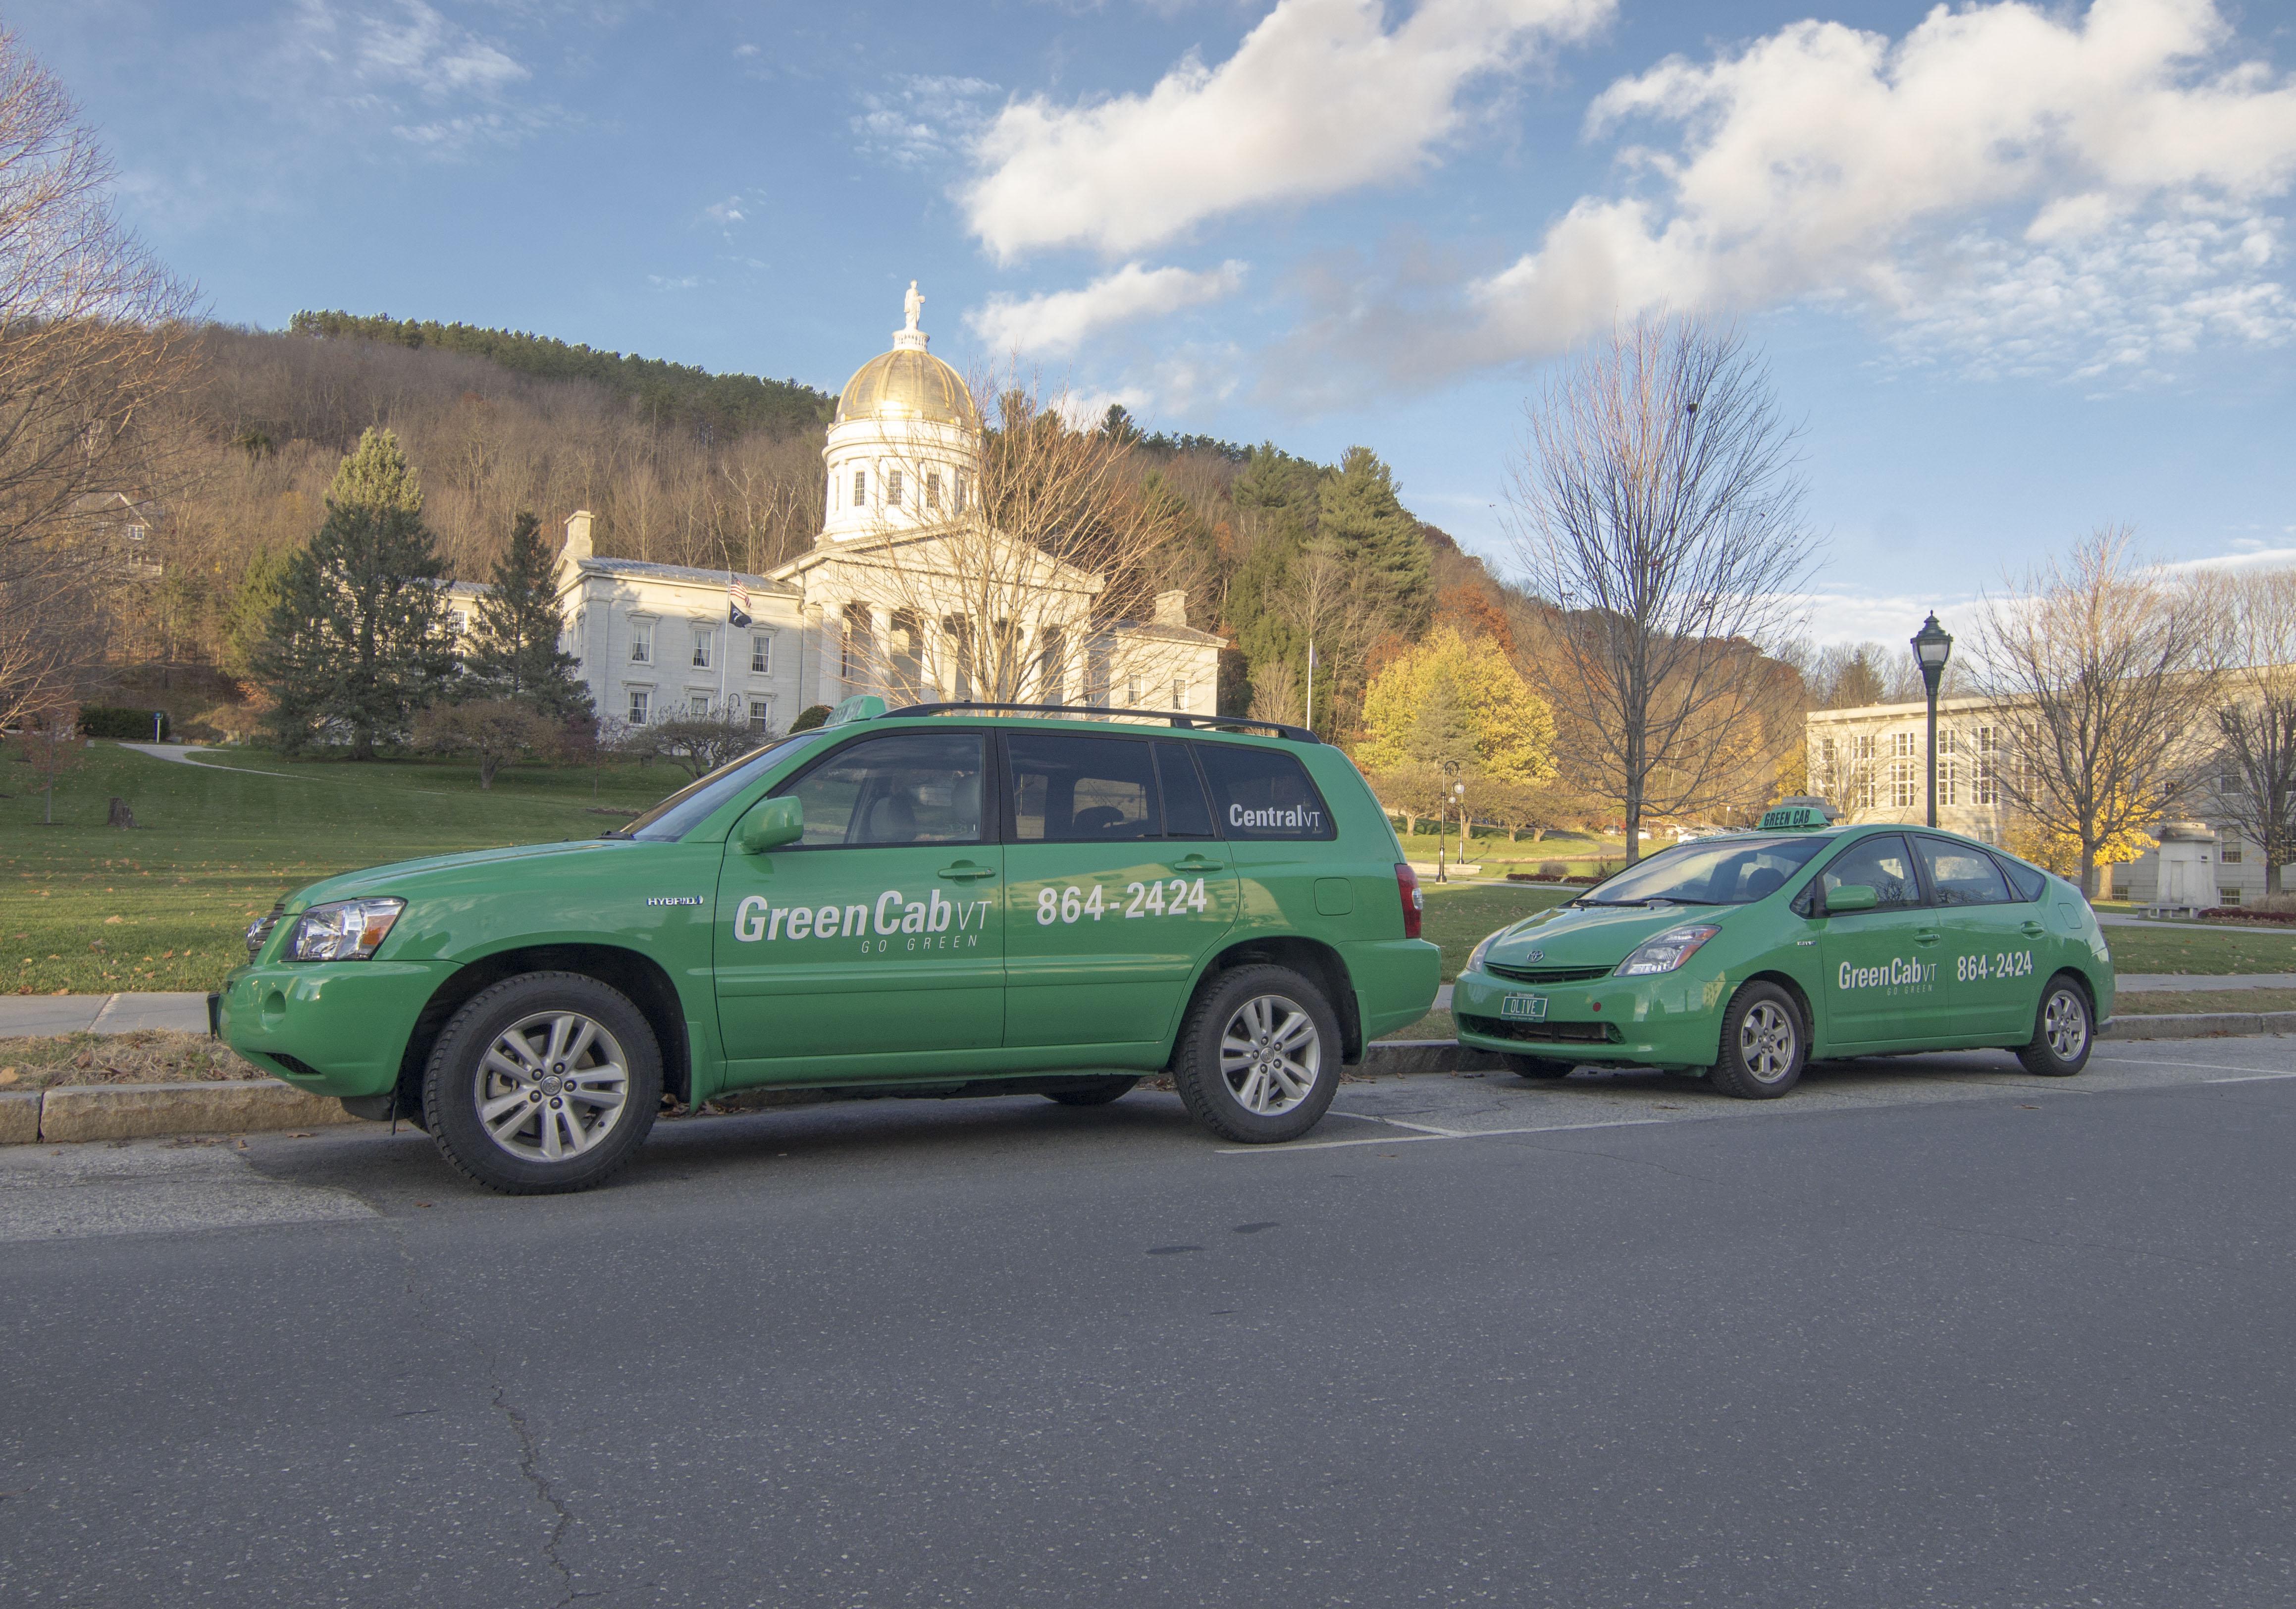 Central VT Green Cab, Montpelier VT